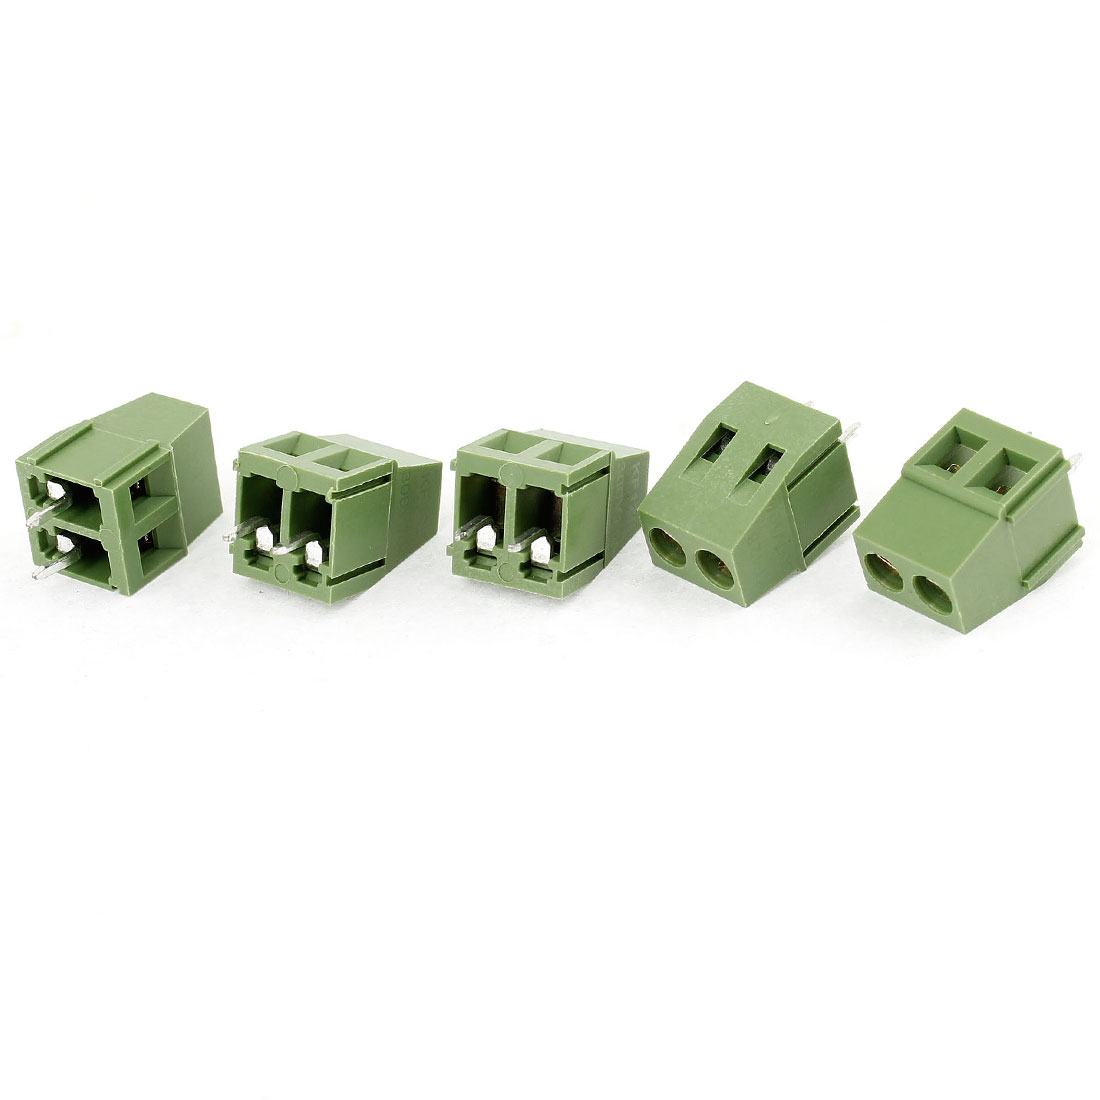 5 Pcs 2 Terminal Plastic Shell PCB Screw Terminal Block Green 300V 10A